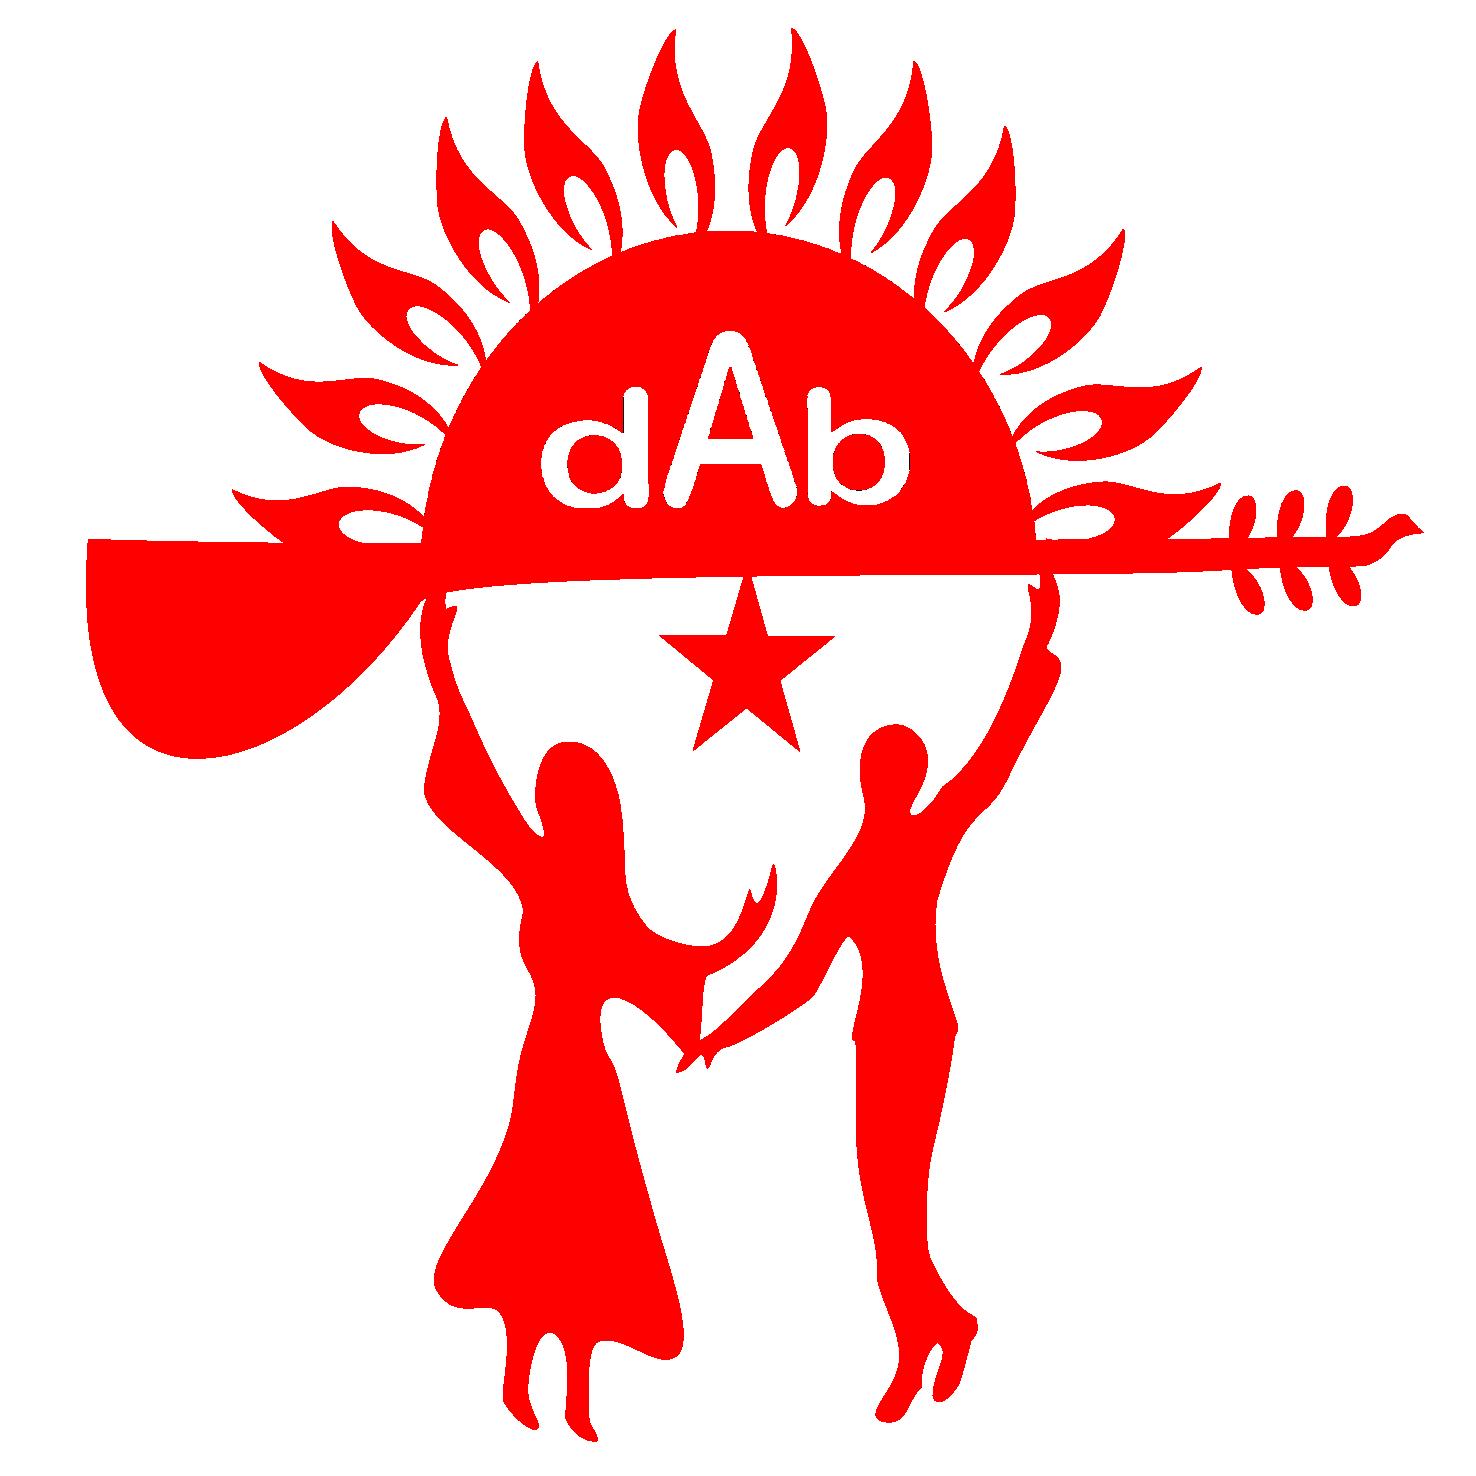 DAB logo kirmizi red